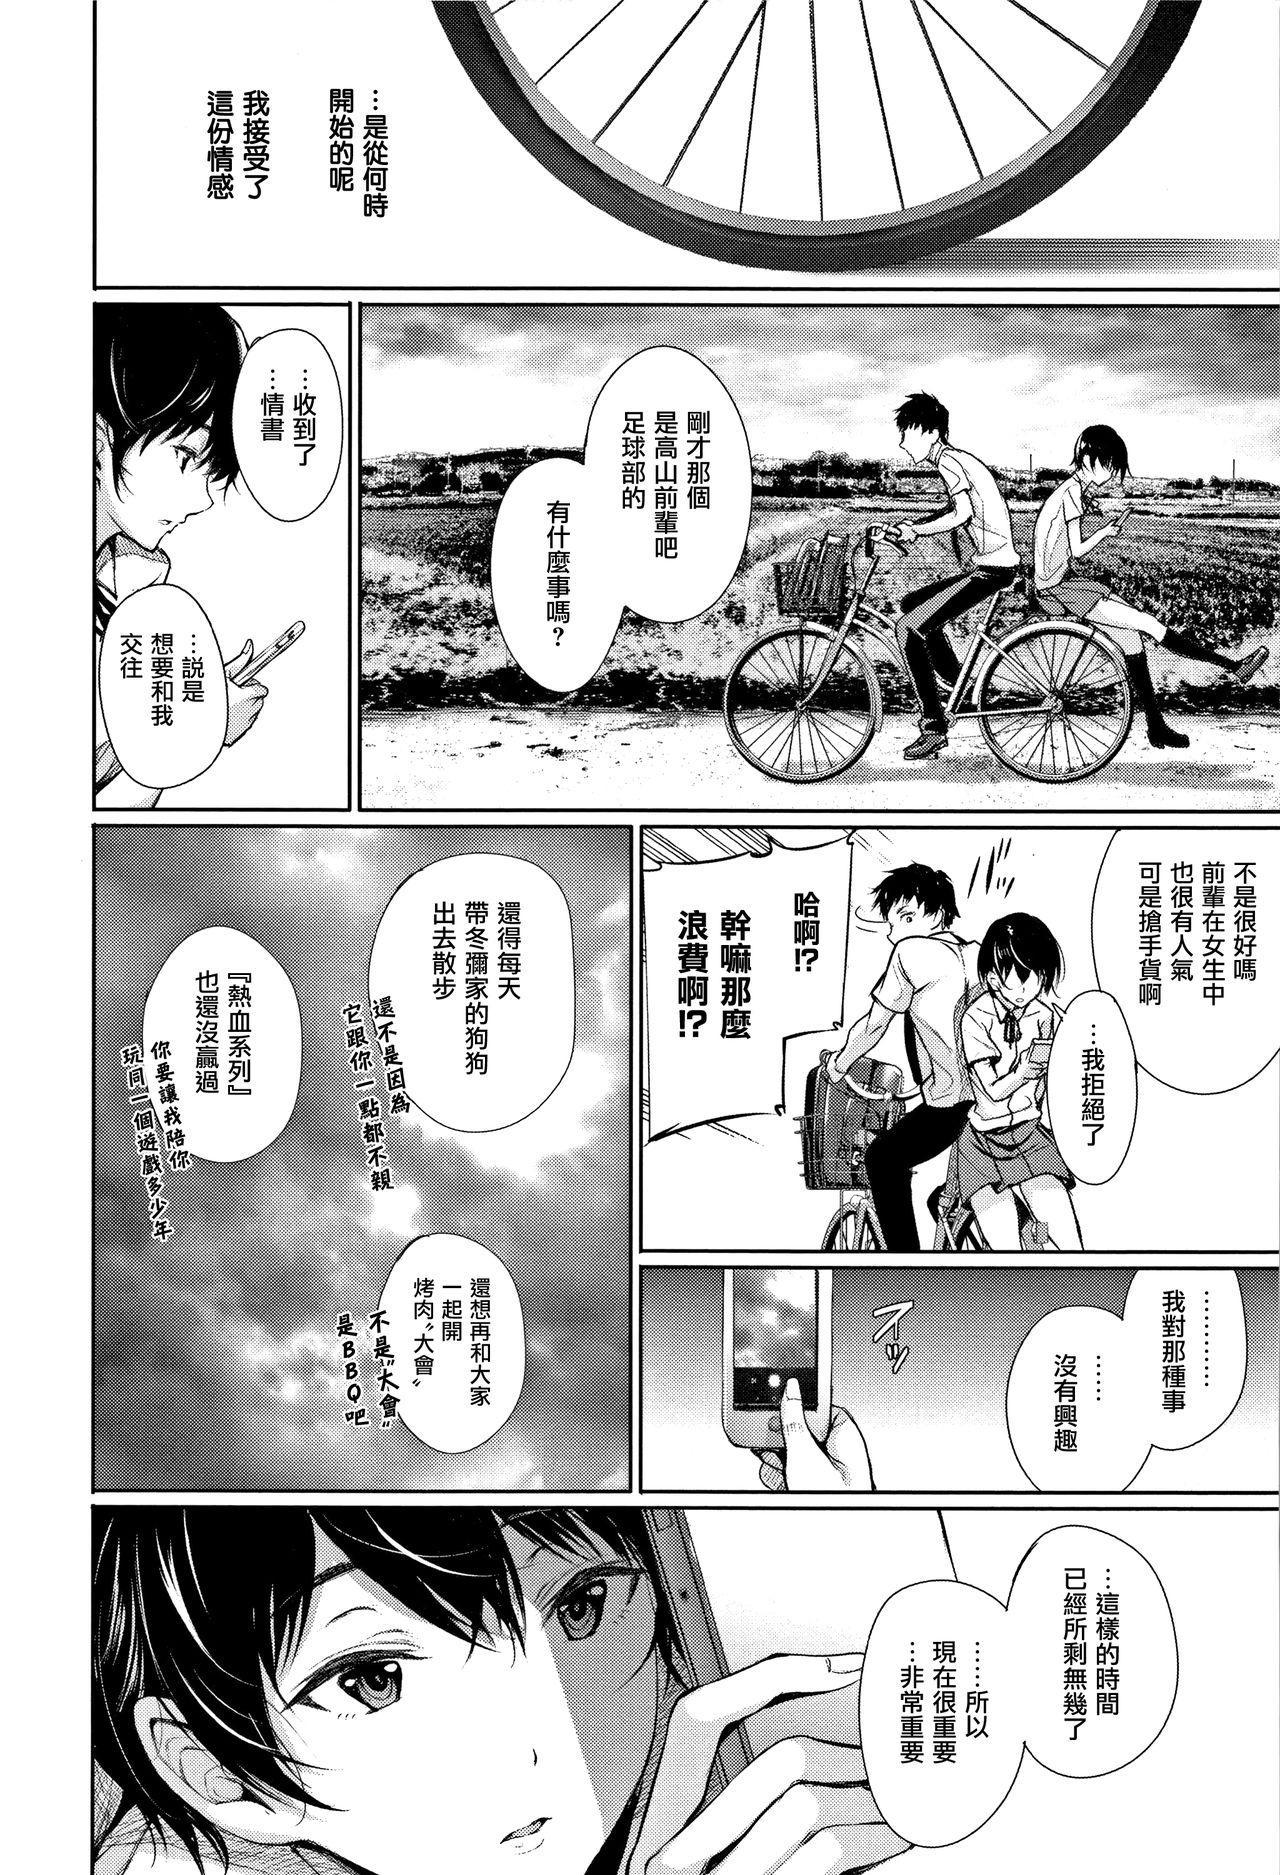 [Gentsuki] Kimi Omou Koi - I think of you. Ch. 1-4 [Chinese] [无毒汉化组] 30